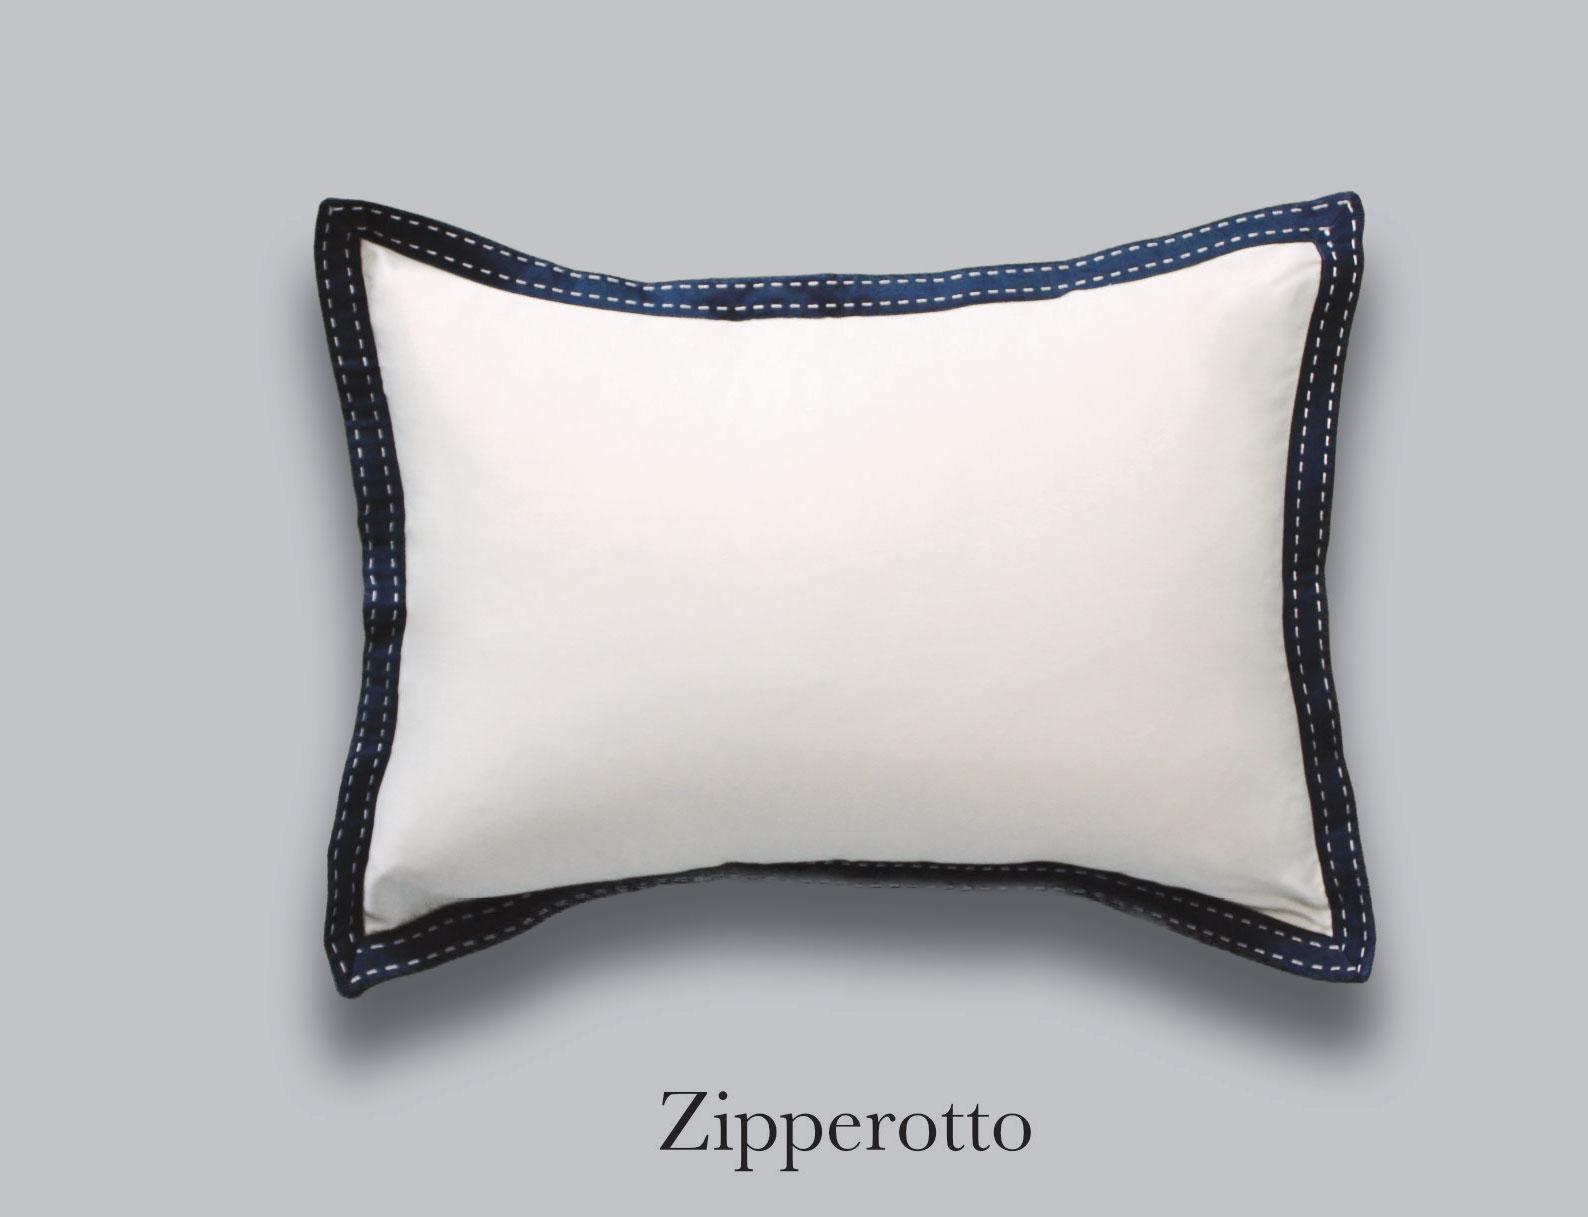 zipperotto